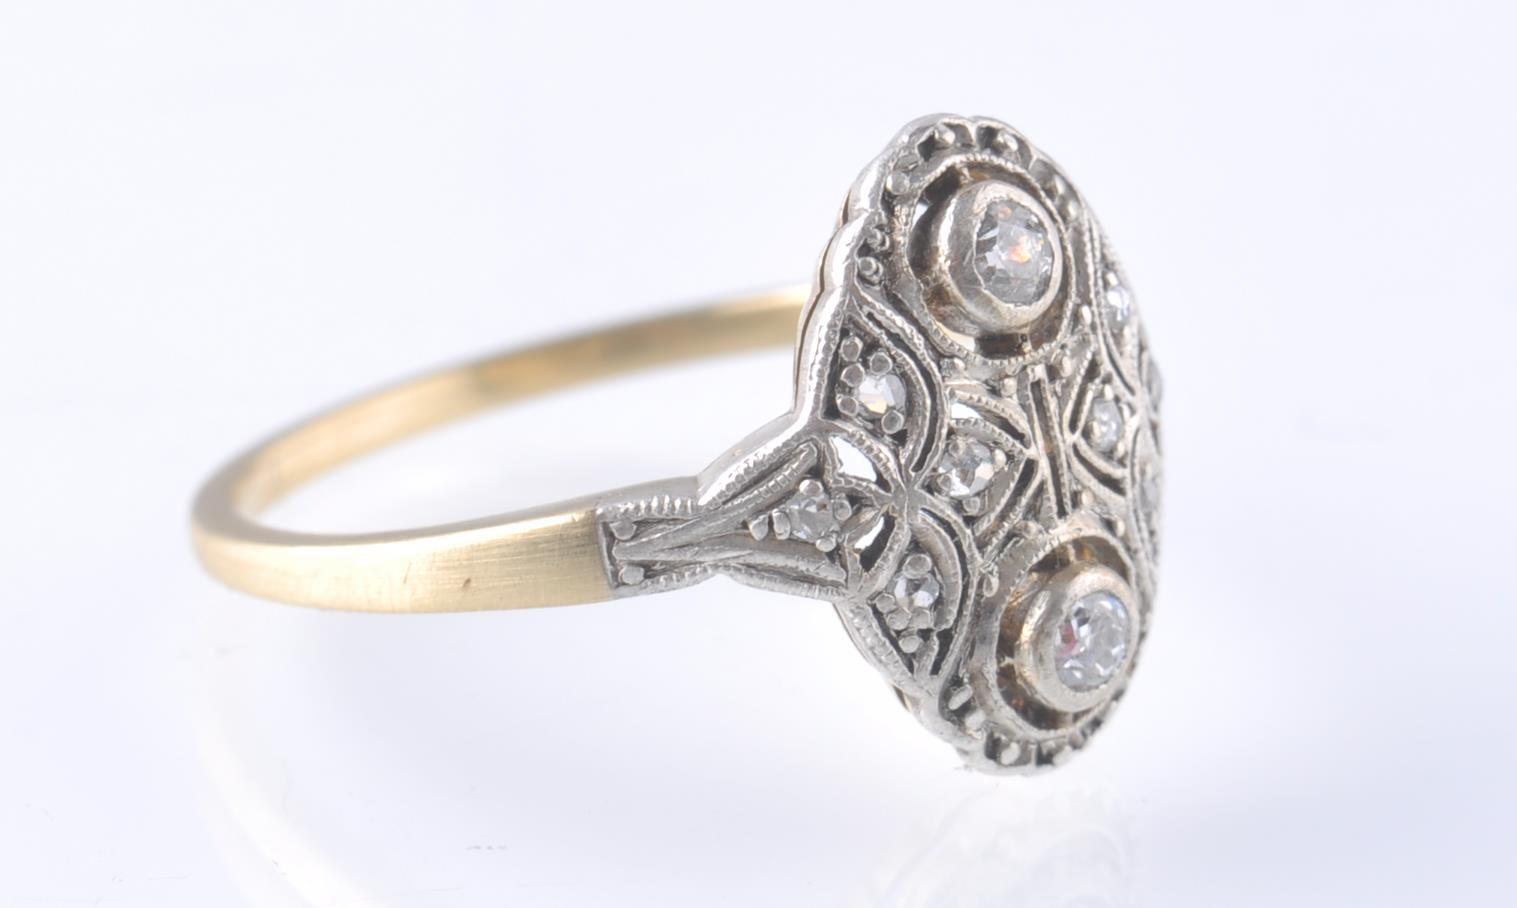 AN 18CT GOLD & PLATINUM ART DECO DIAMOND RING - Image 3 of 3